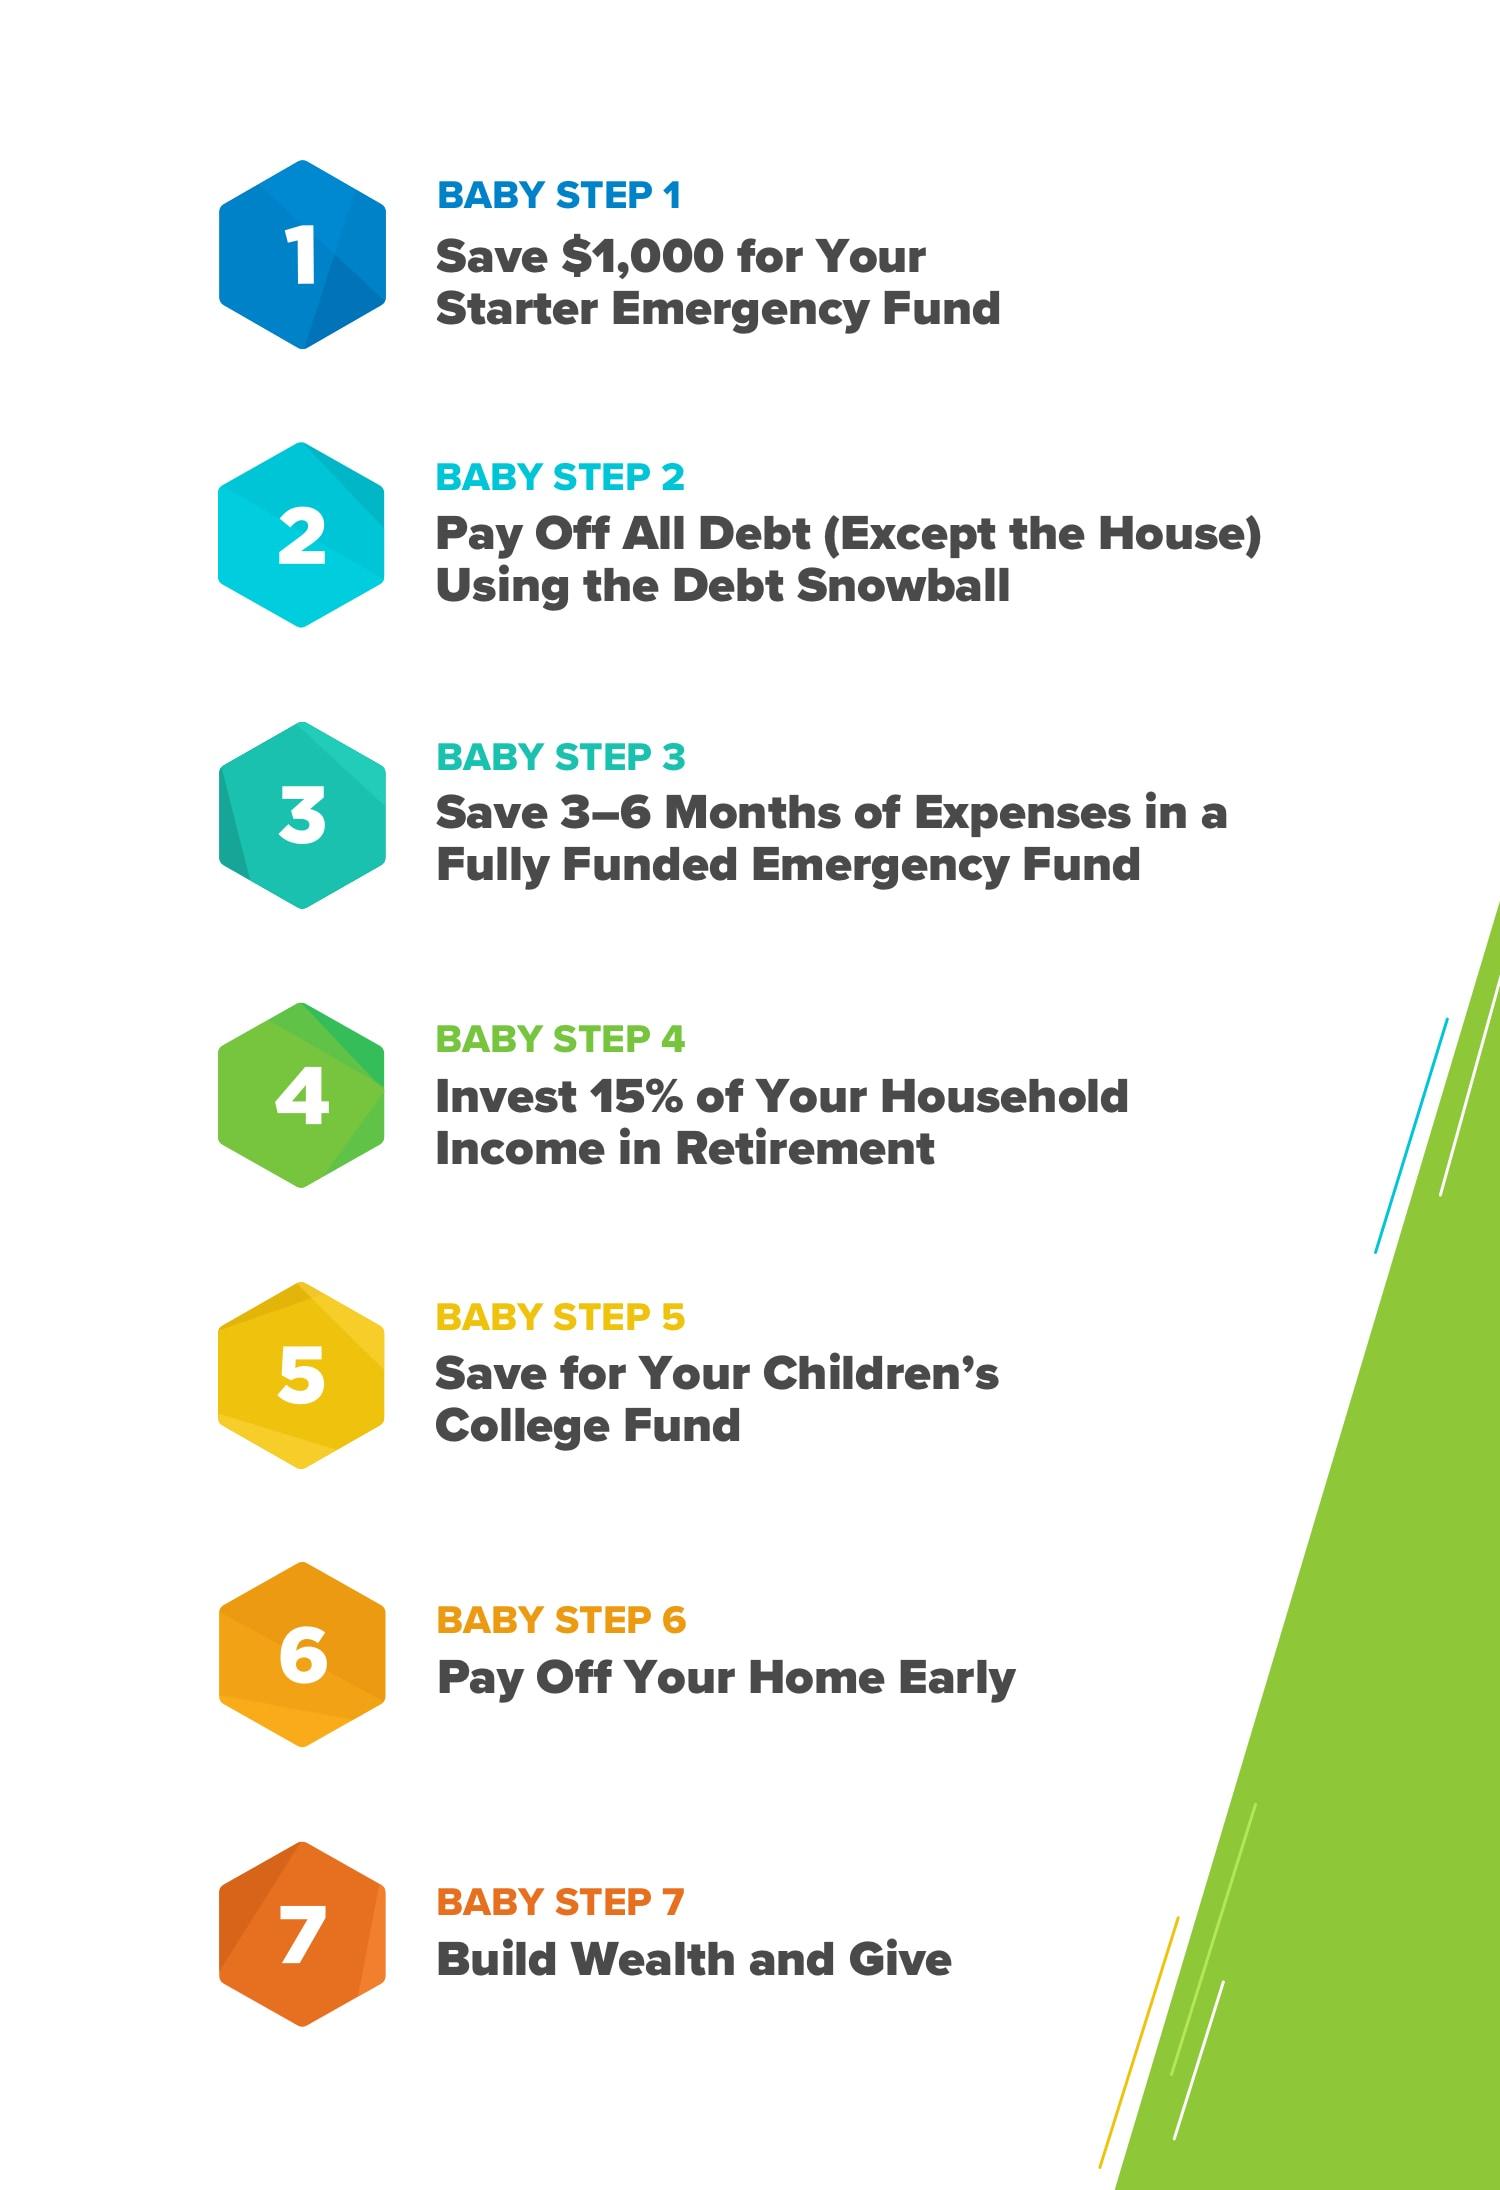 Dave Ramey's Seven Baby Steps PDF